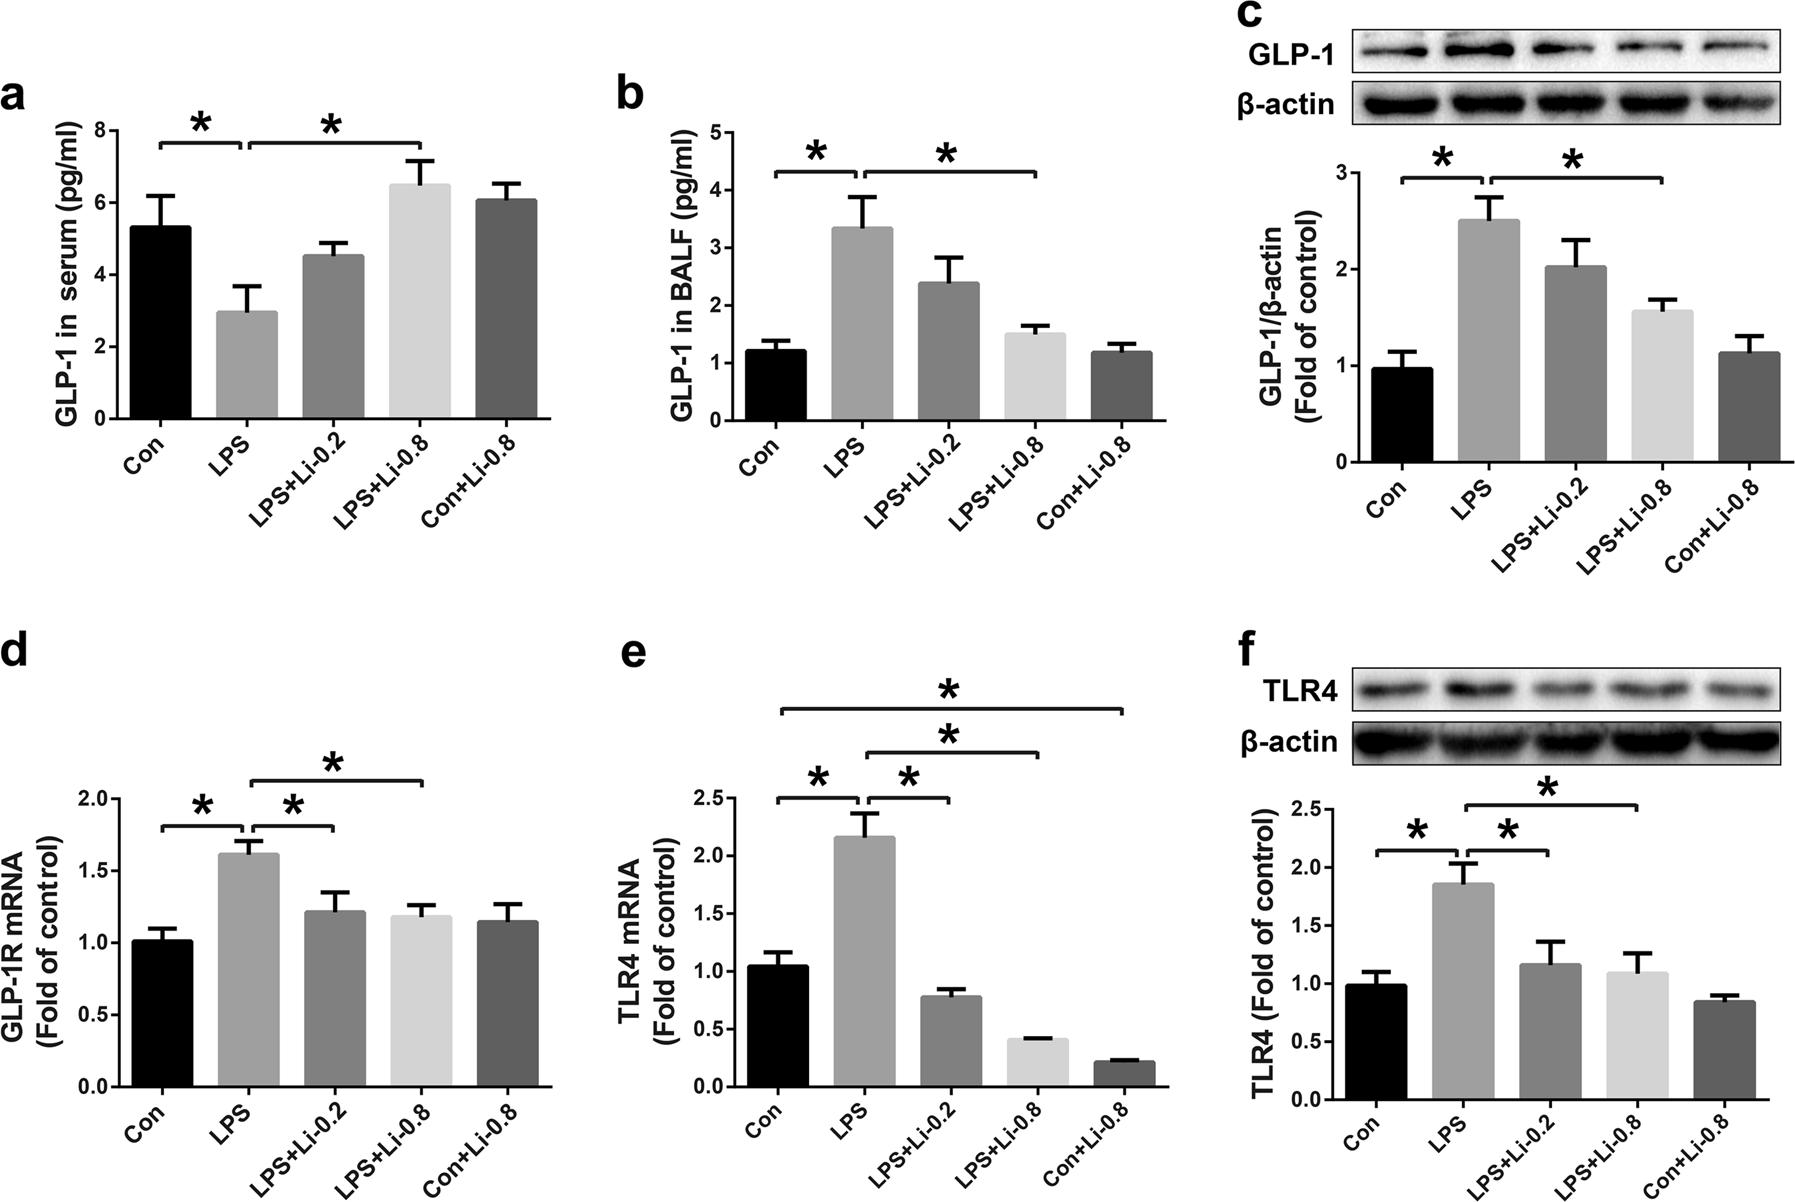 Glucagon-like peptide-1 receptor activation alleviates